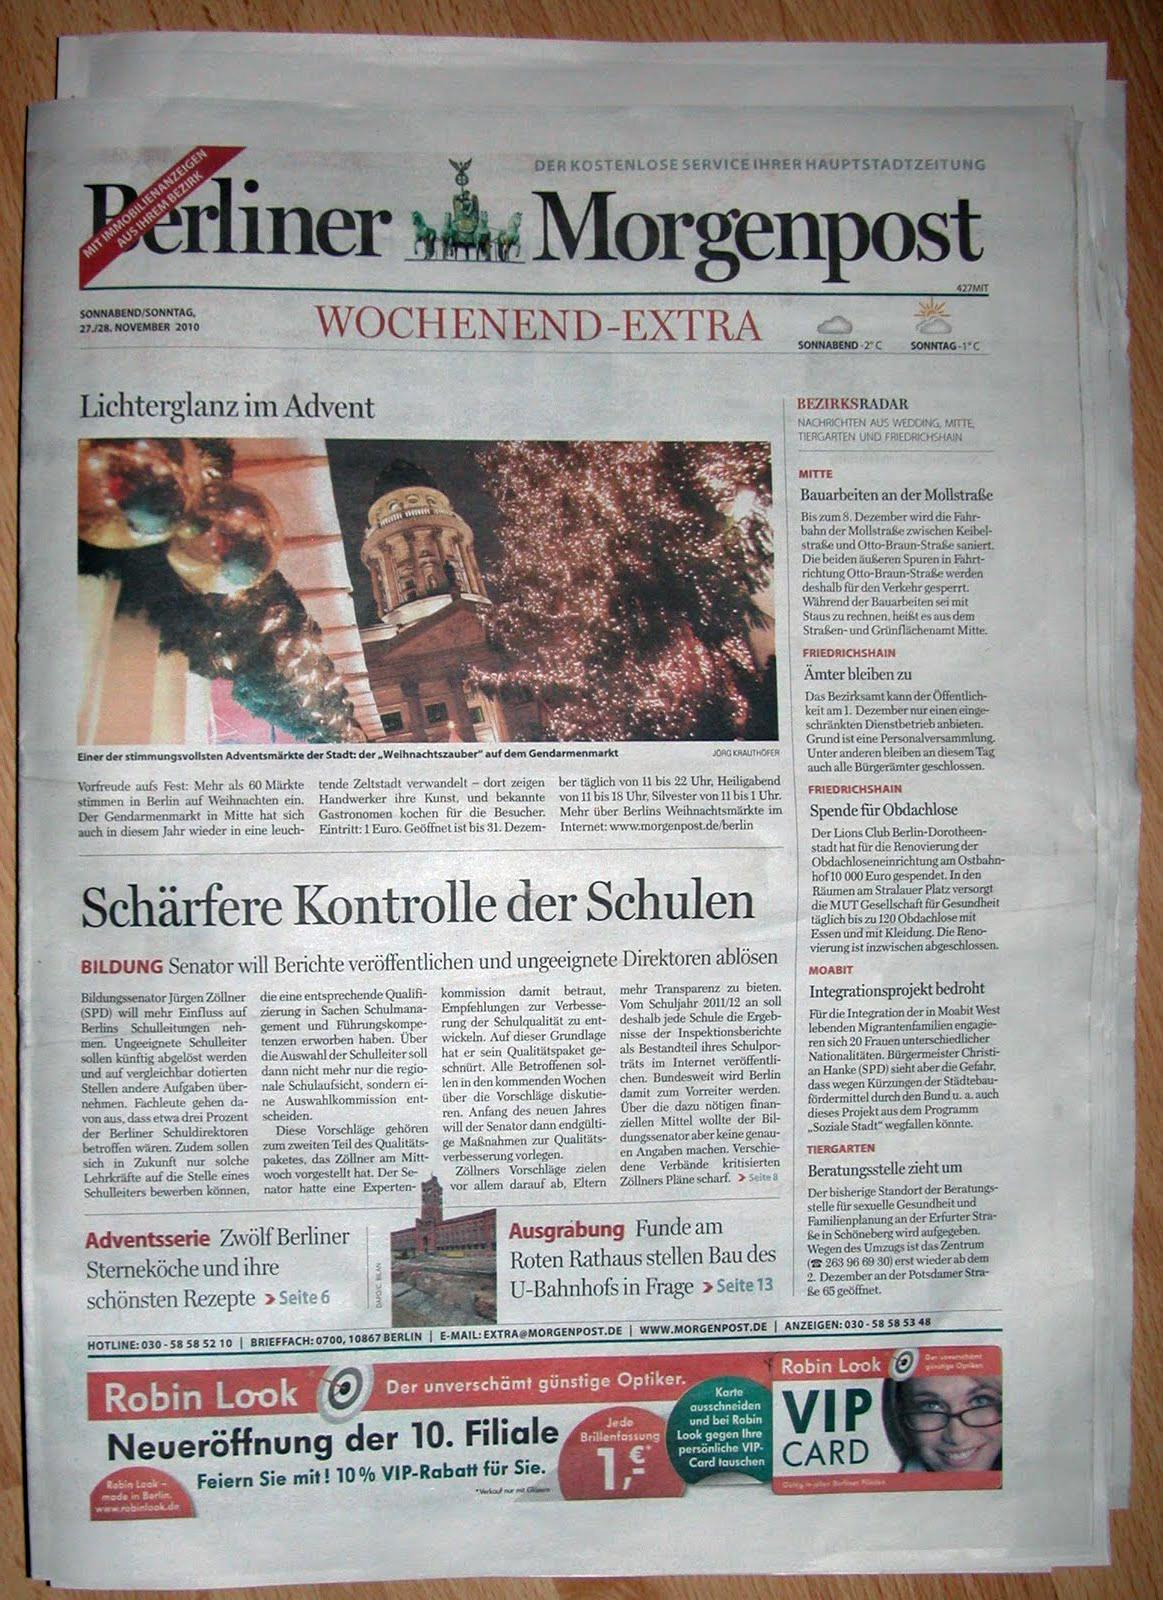 Berliner Morgenpost Wochenend Extra, November 2010